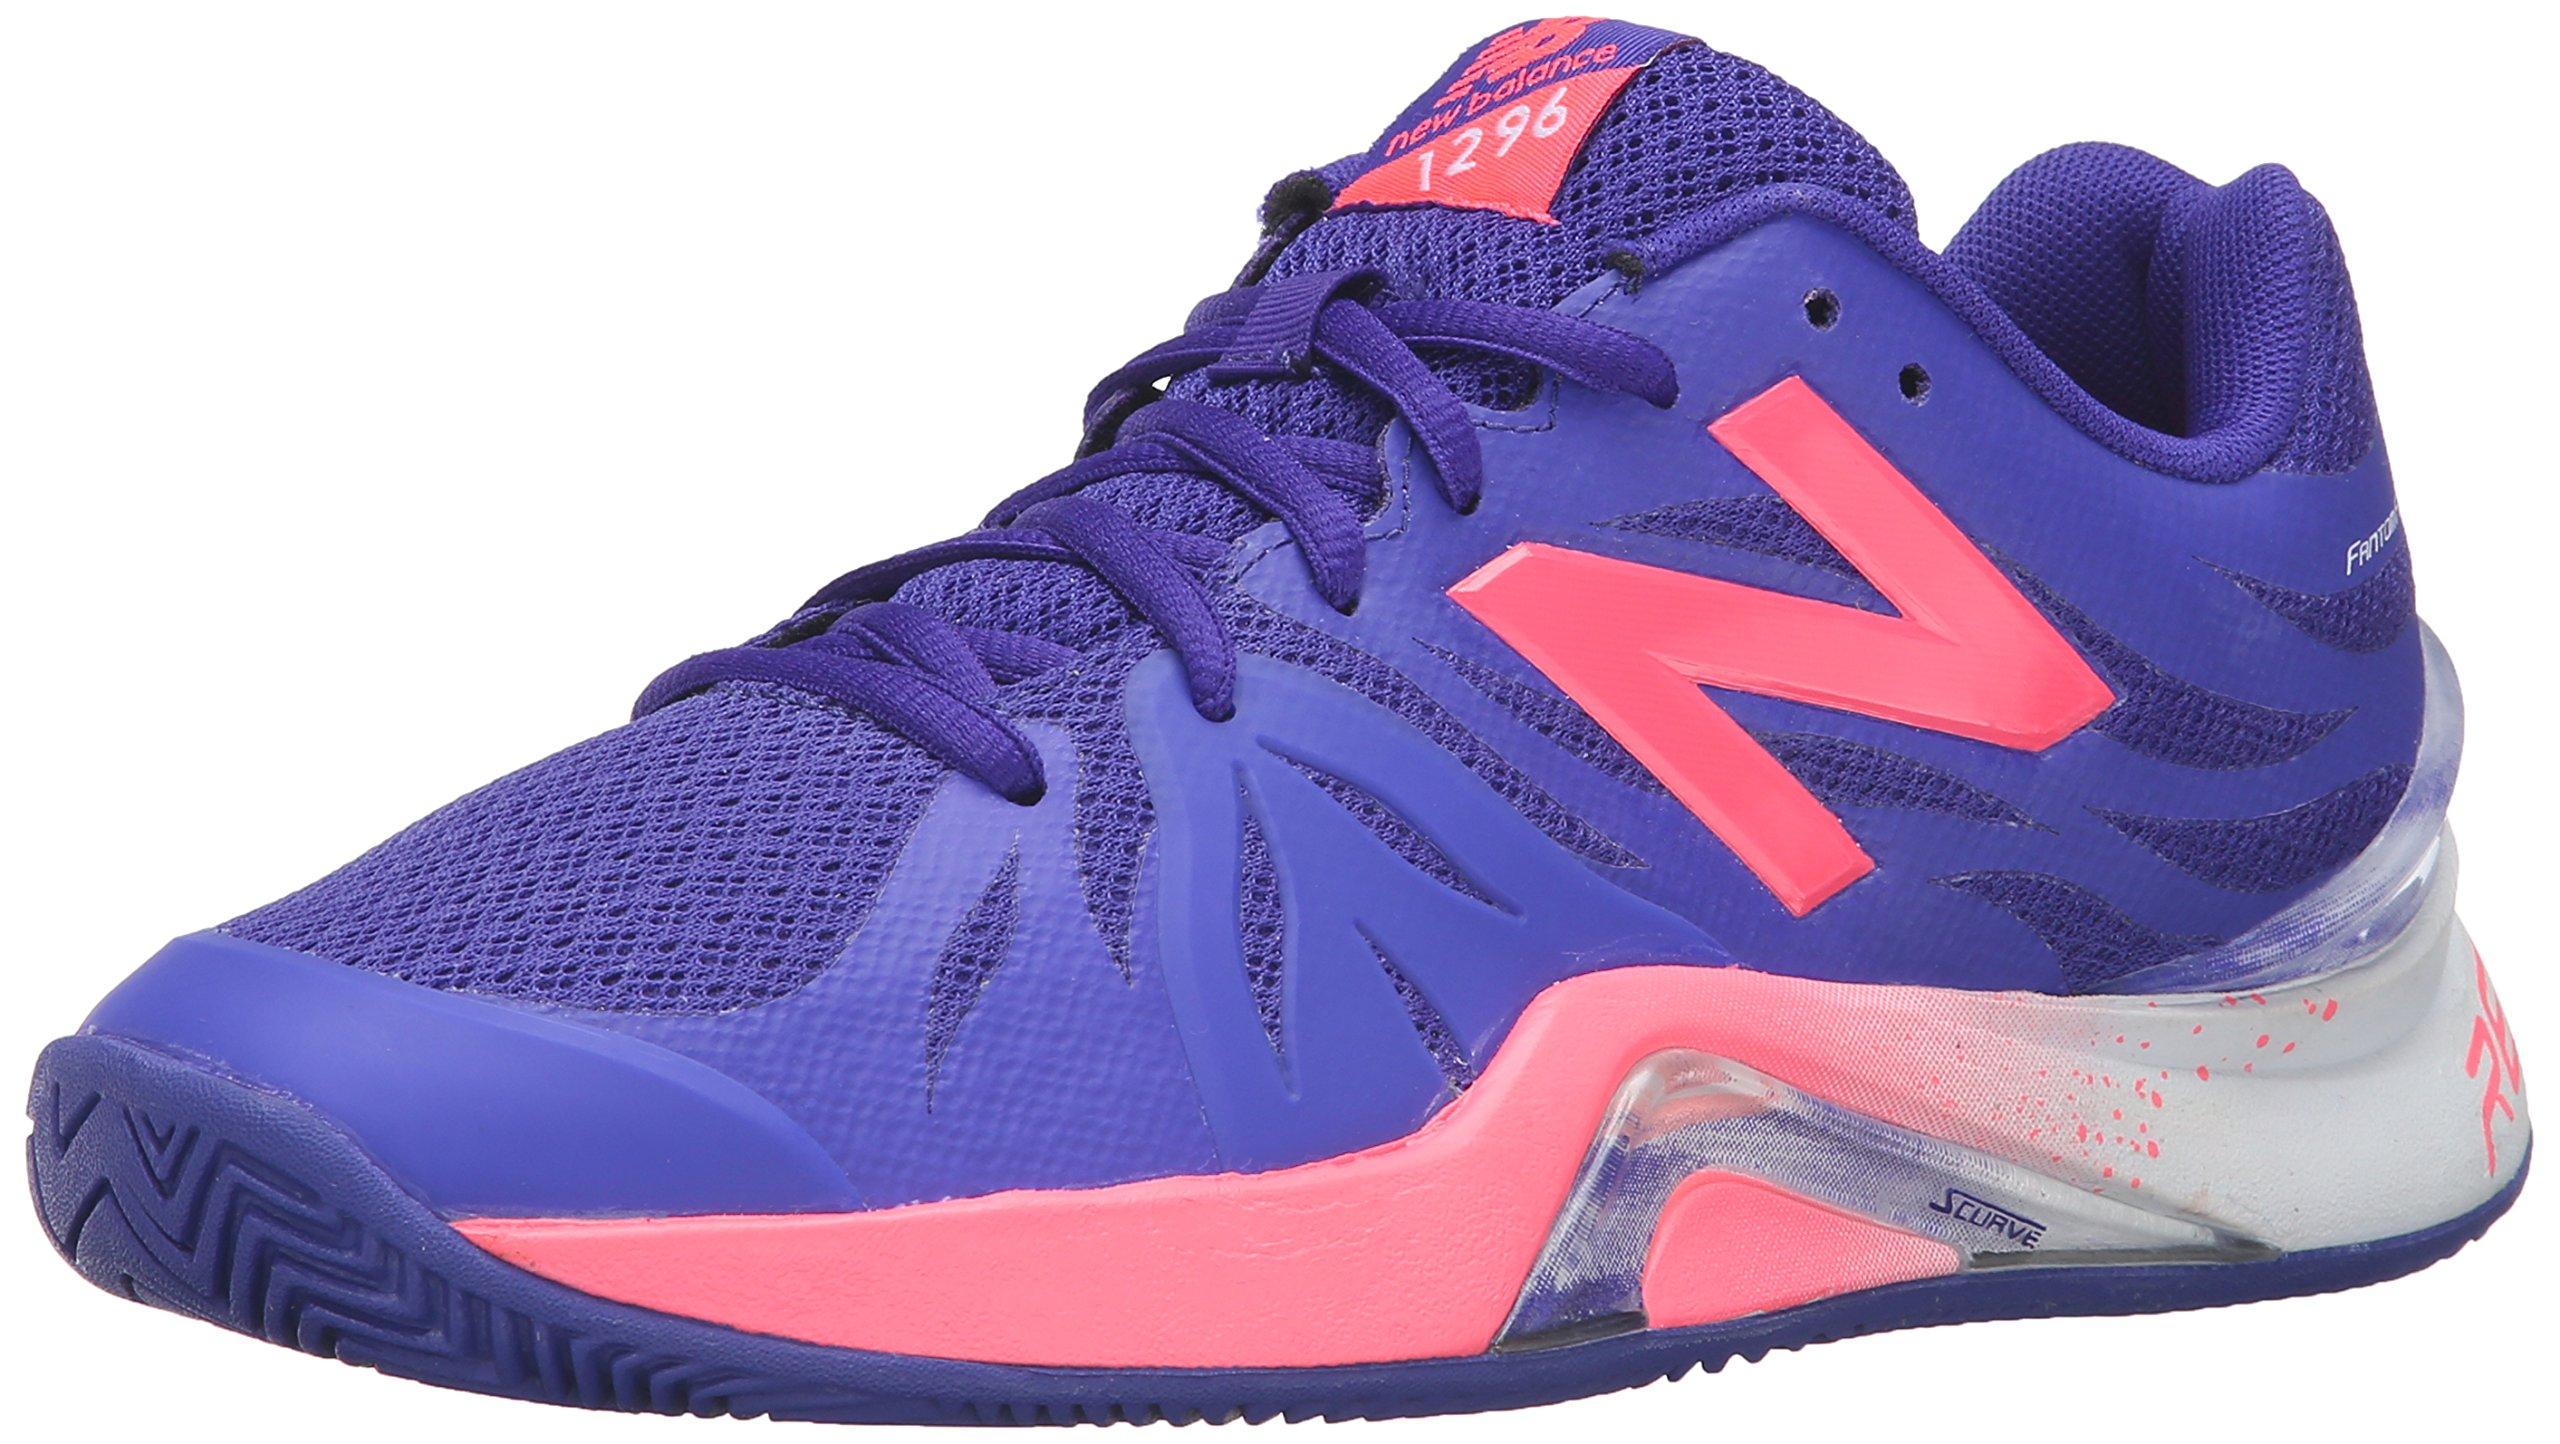 New Balance Women's 1296v2 Tennis Shoe, Blue/Guava, 9 B US